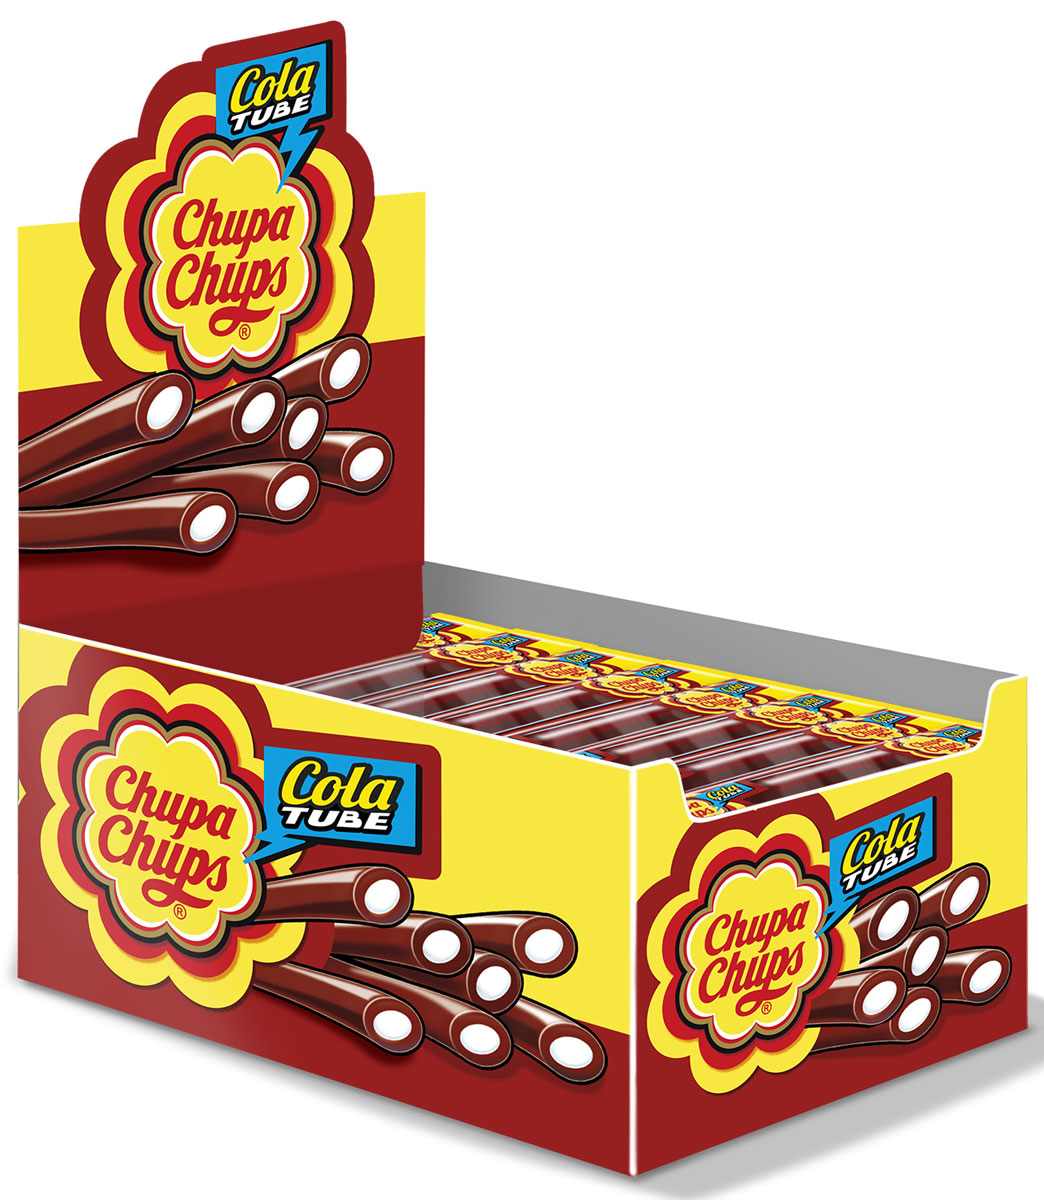 Chupa-Chups Cola Tube жевательный мармелад со вкусом колы, 50 шт по 10 г ароматизатор chupa chups chp401